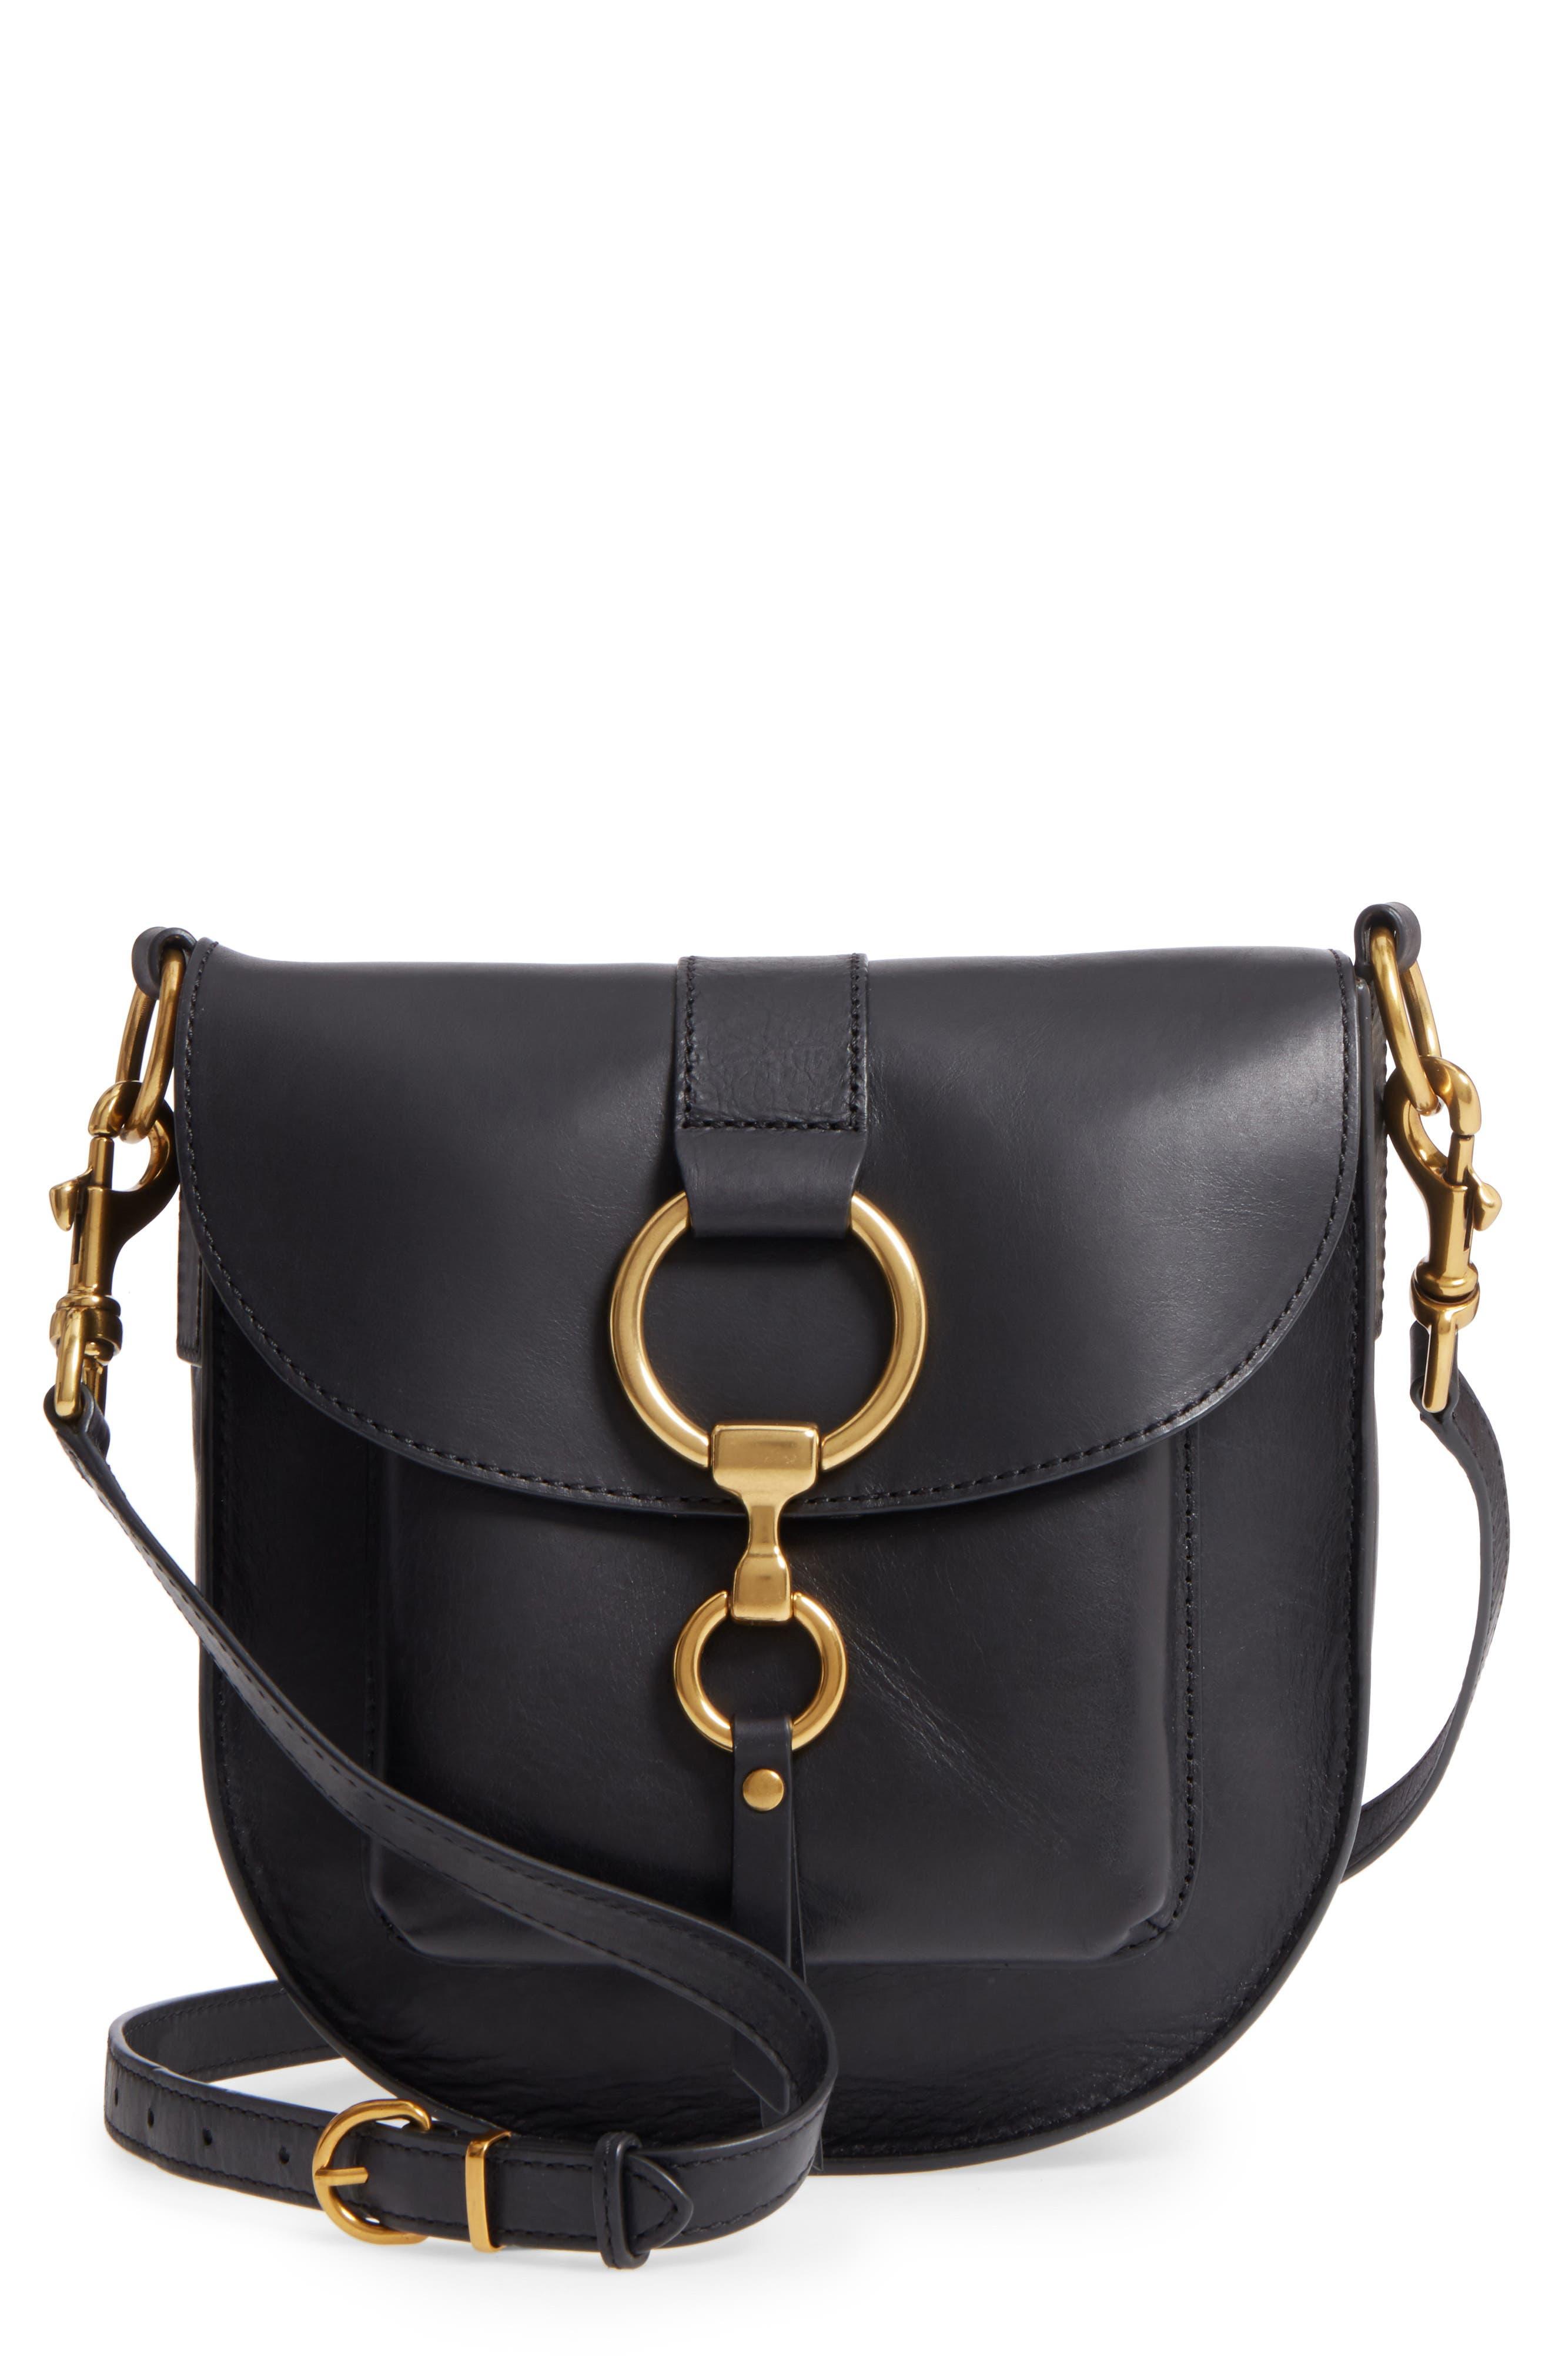 Ilana Leather Saddle Bag,                             Main thumbnail 1, color,                             Black